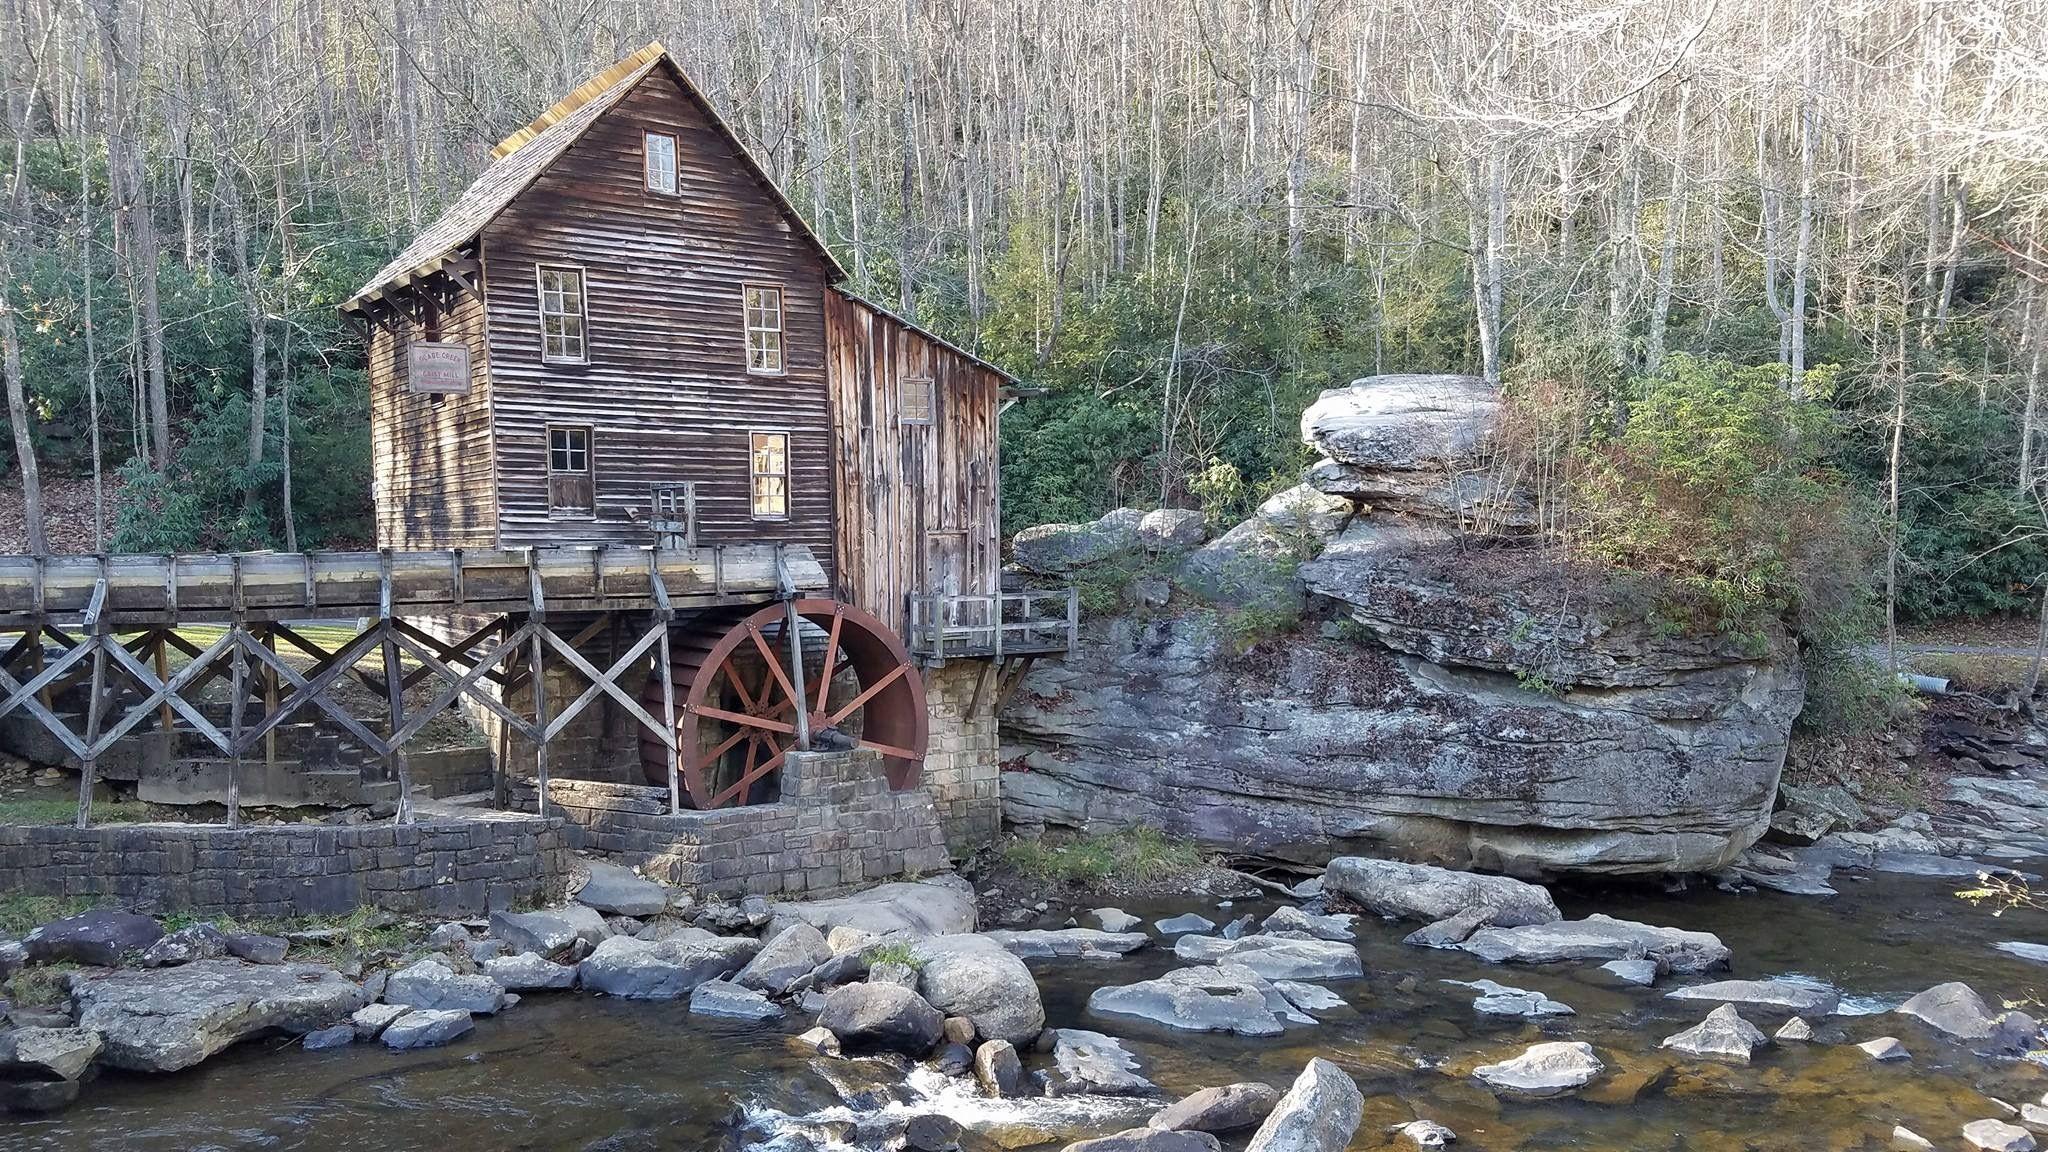 sw springs splish splash in sevierville es tn dollywood elk near resort cabin cabins